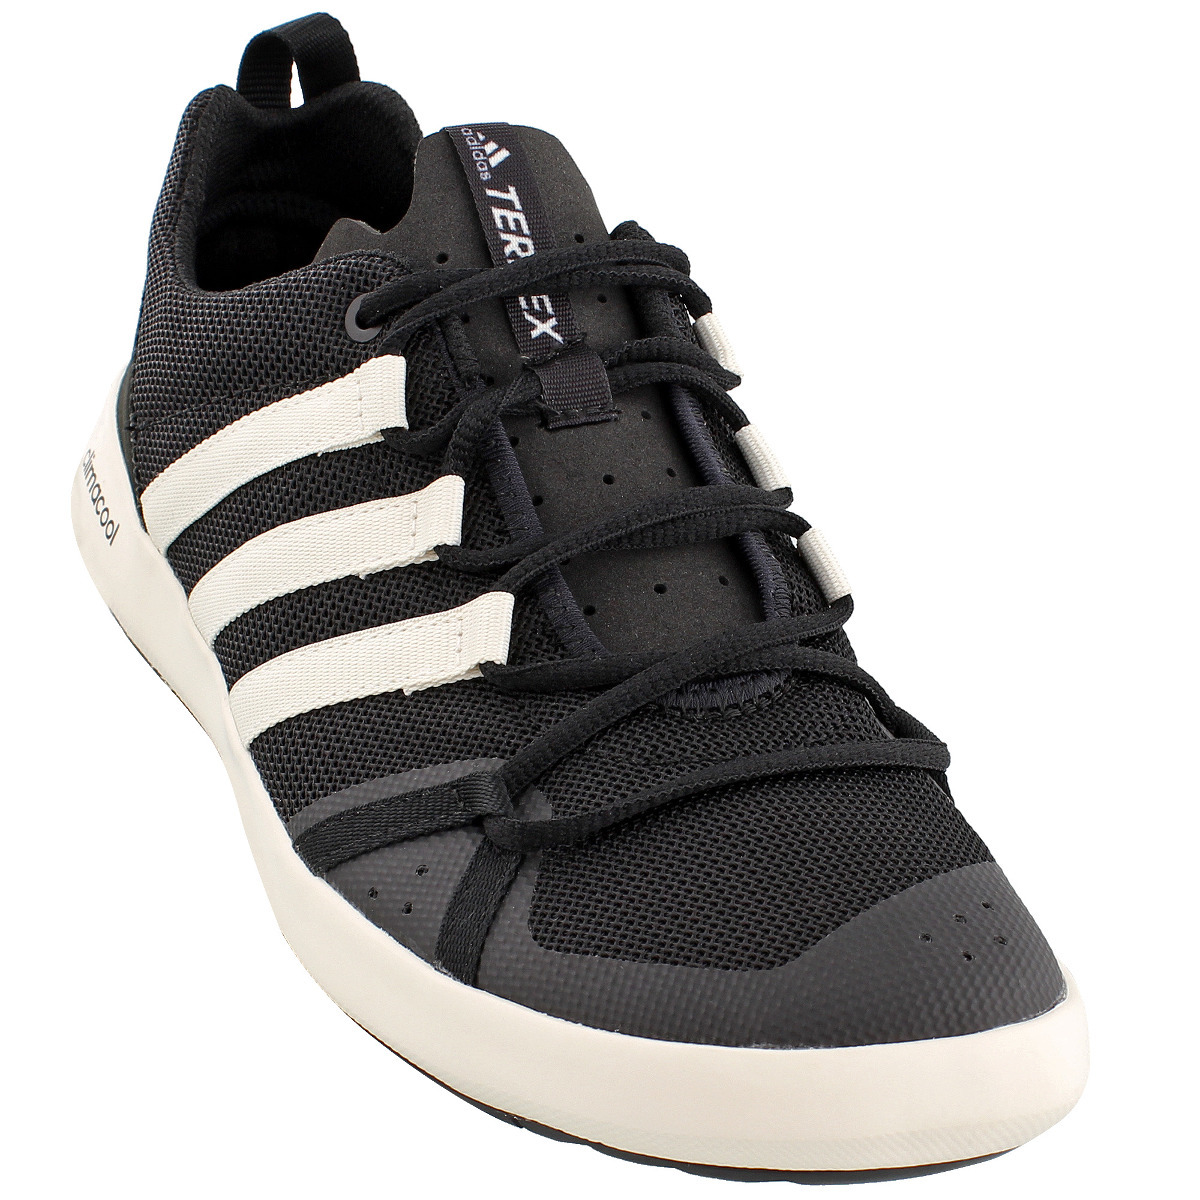 ADIDAS Men's Terrex Climacool Boat Shoes